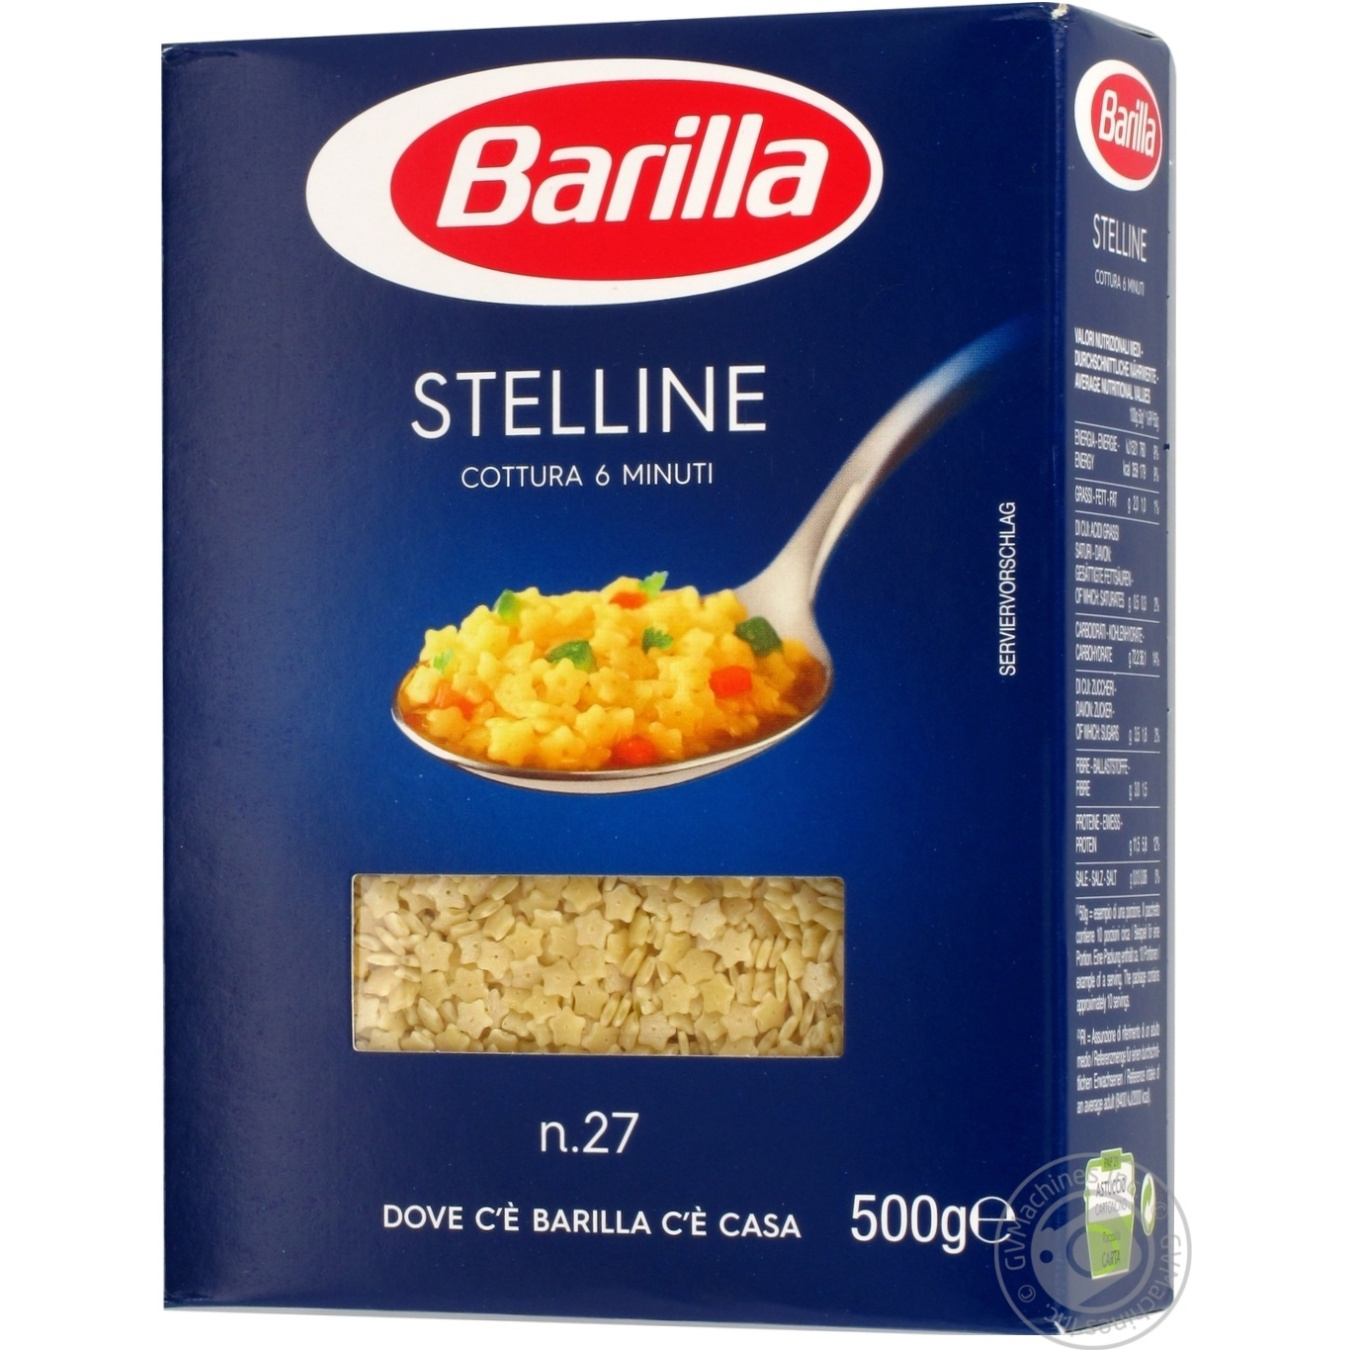 BARILLA СТЕЛІНЕ №27 500Г